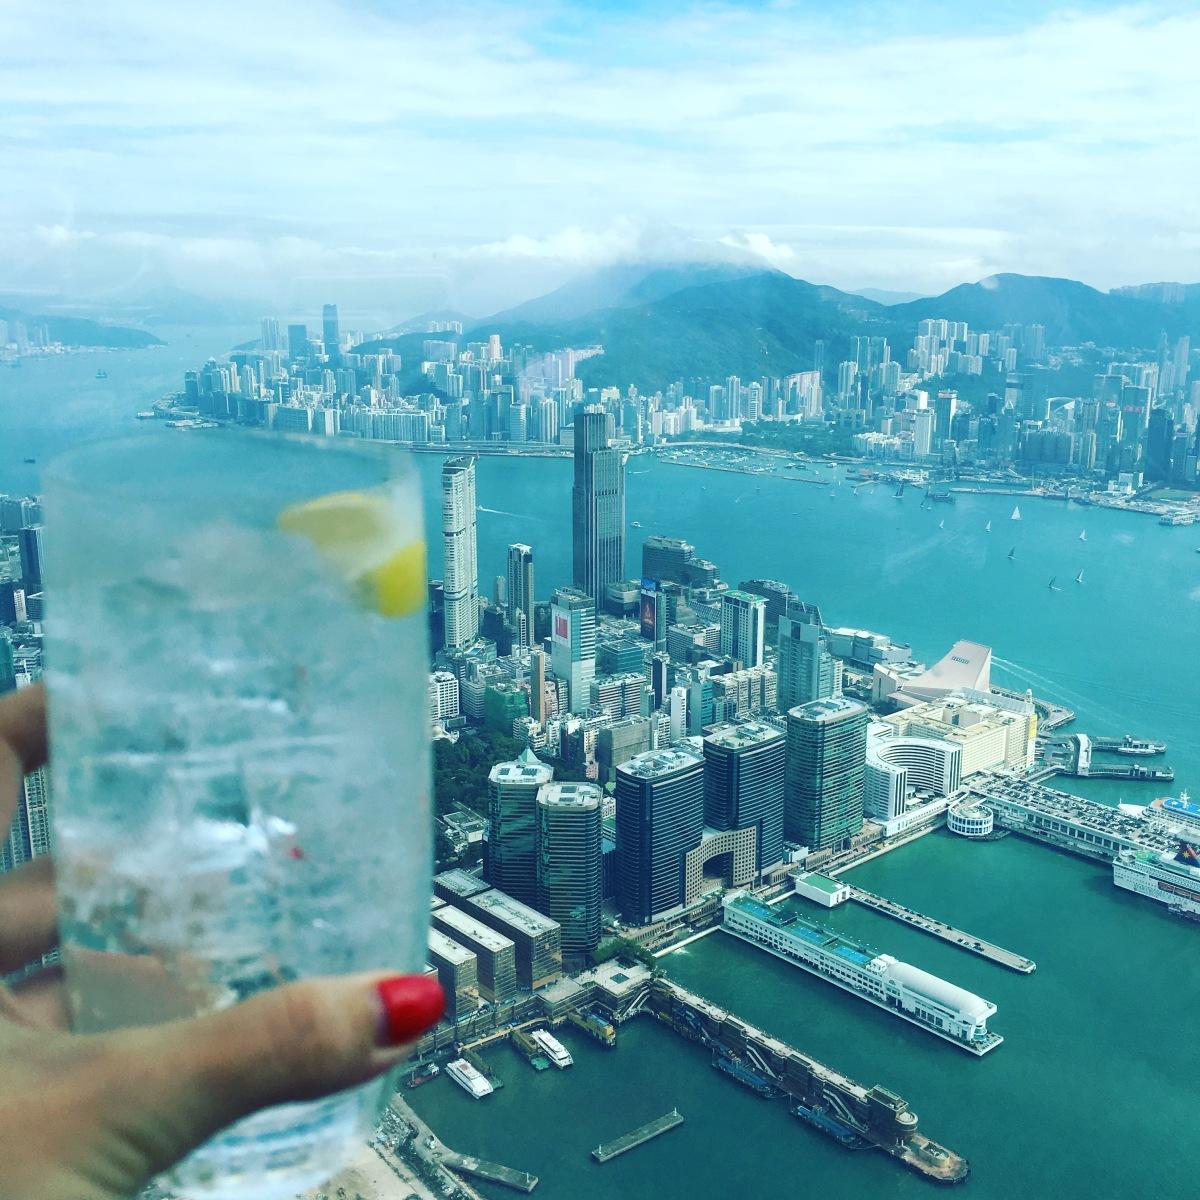 PopsicleSociety-Hong Kong